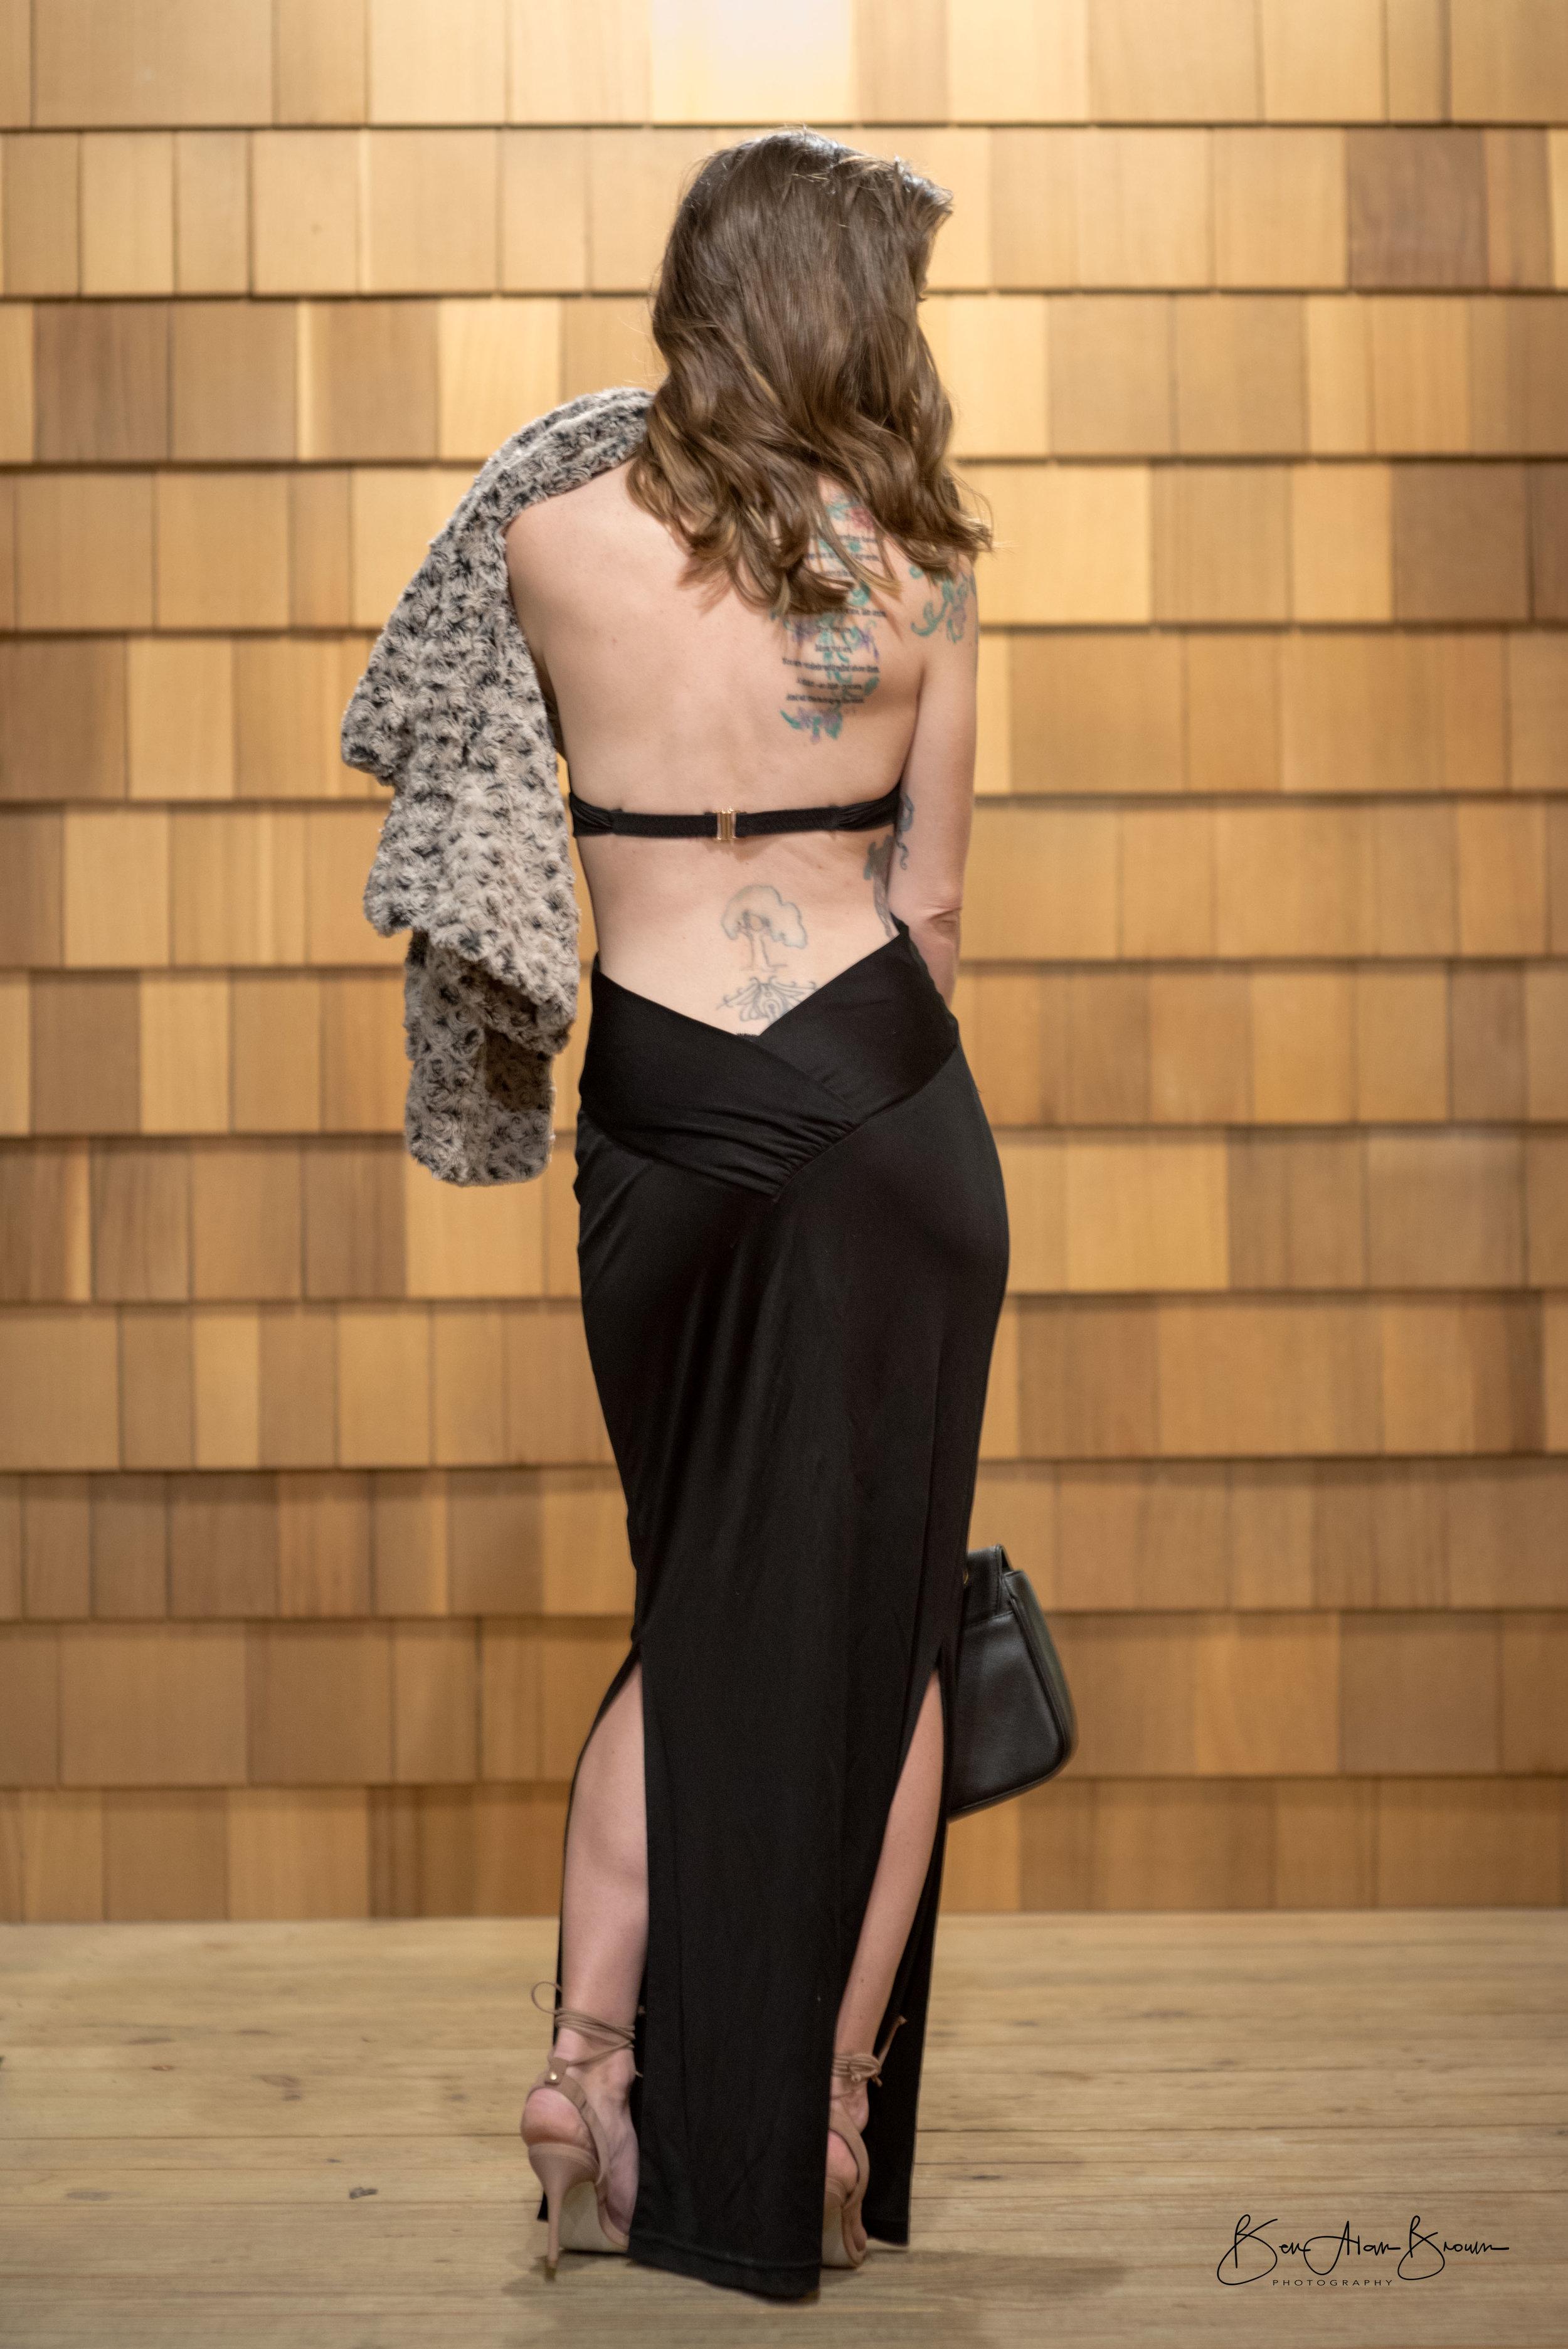 agent-provocateur-dress.jpg